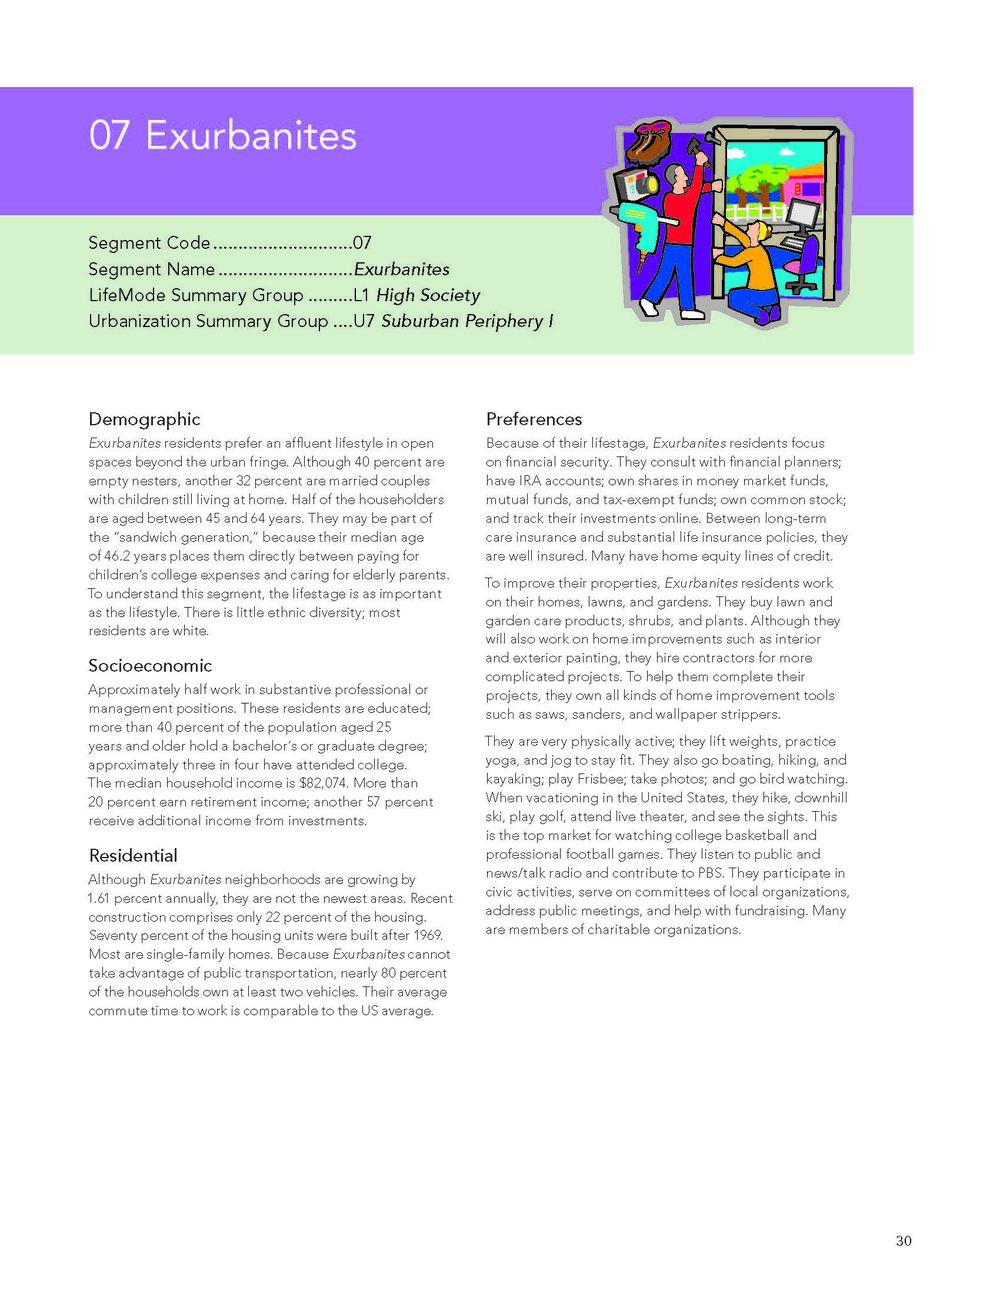 tapestry-segmentation_Page_33.jpg